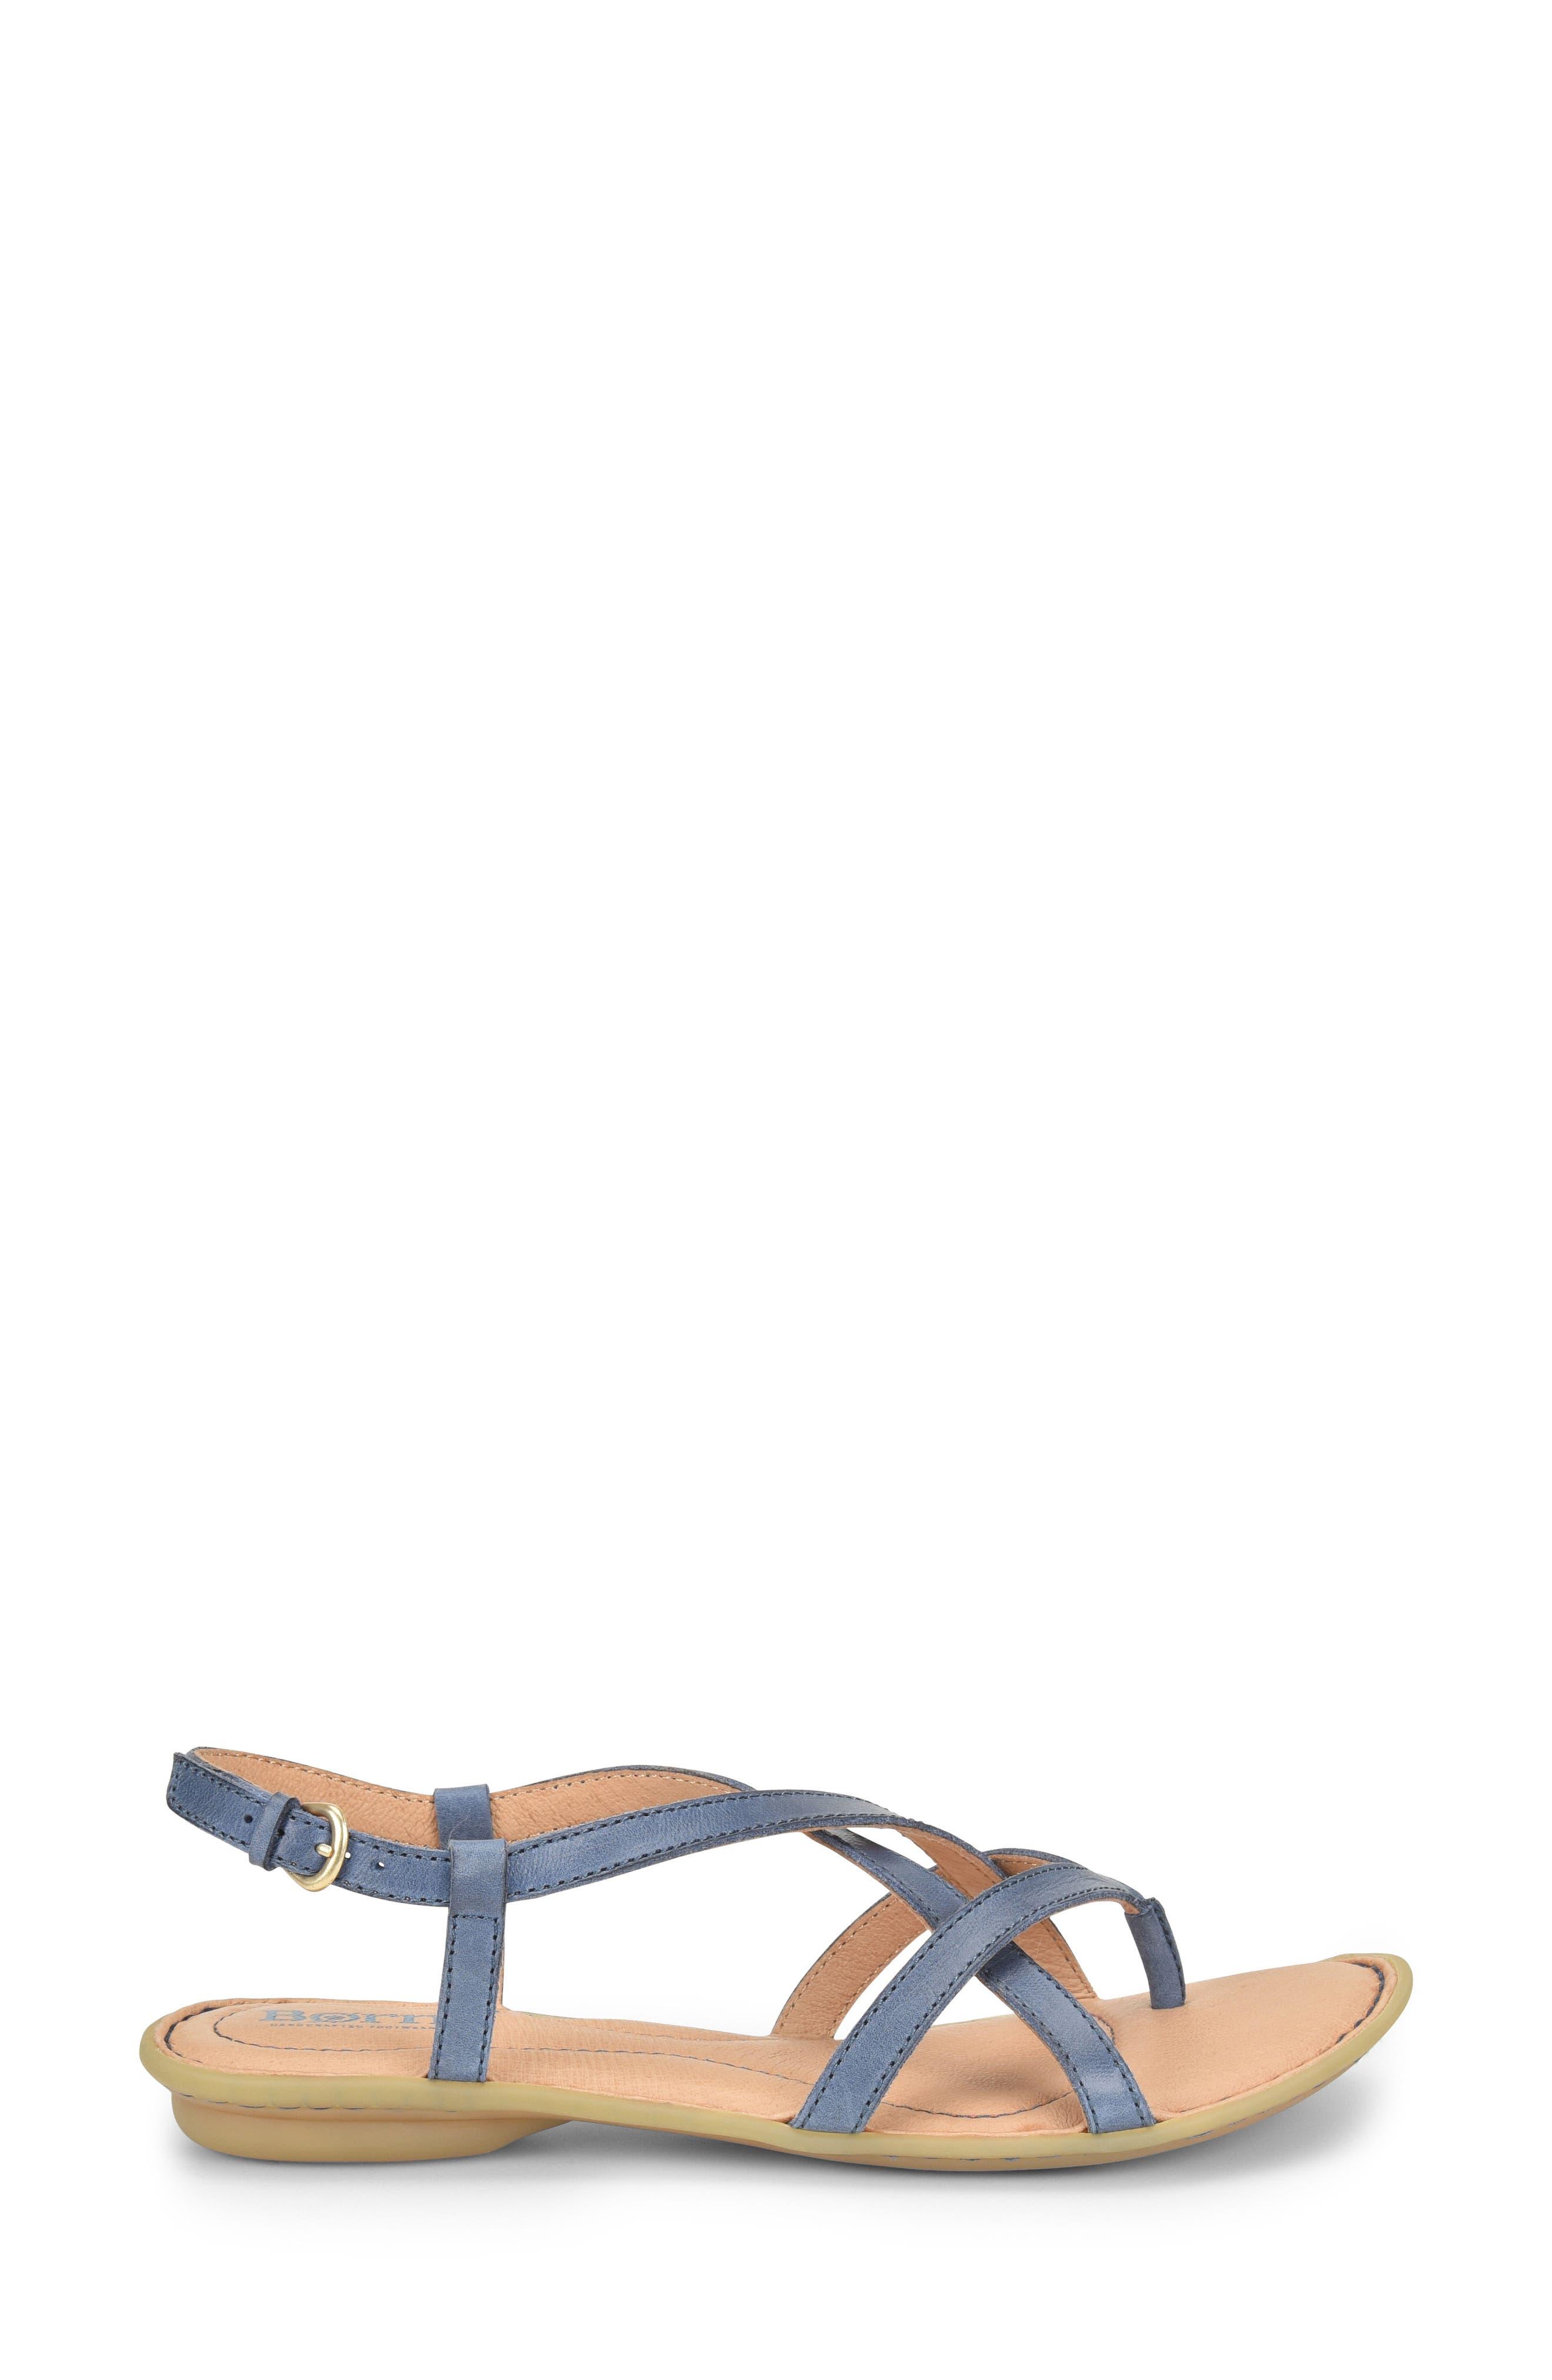 Mai Strap Sandal,                             Alternate thumbnail 3, color,                             Navy Leather